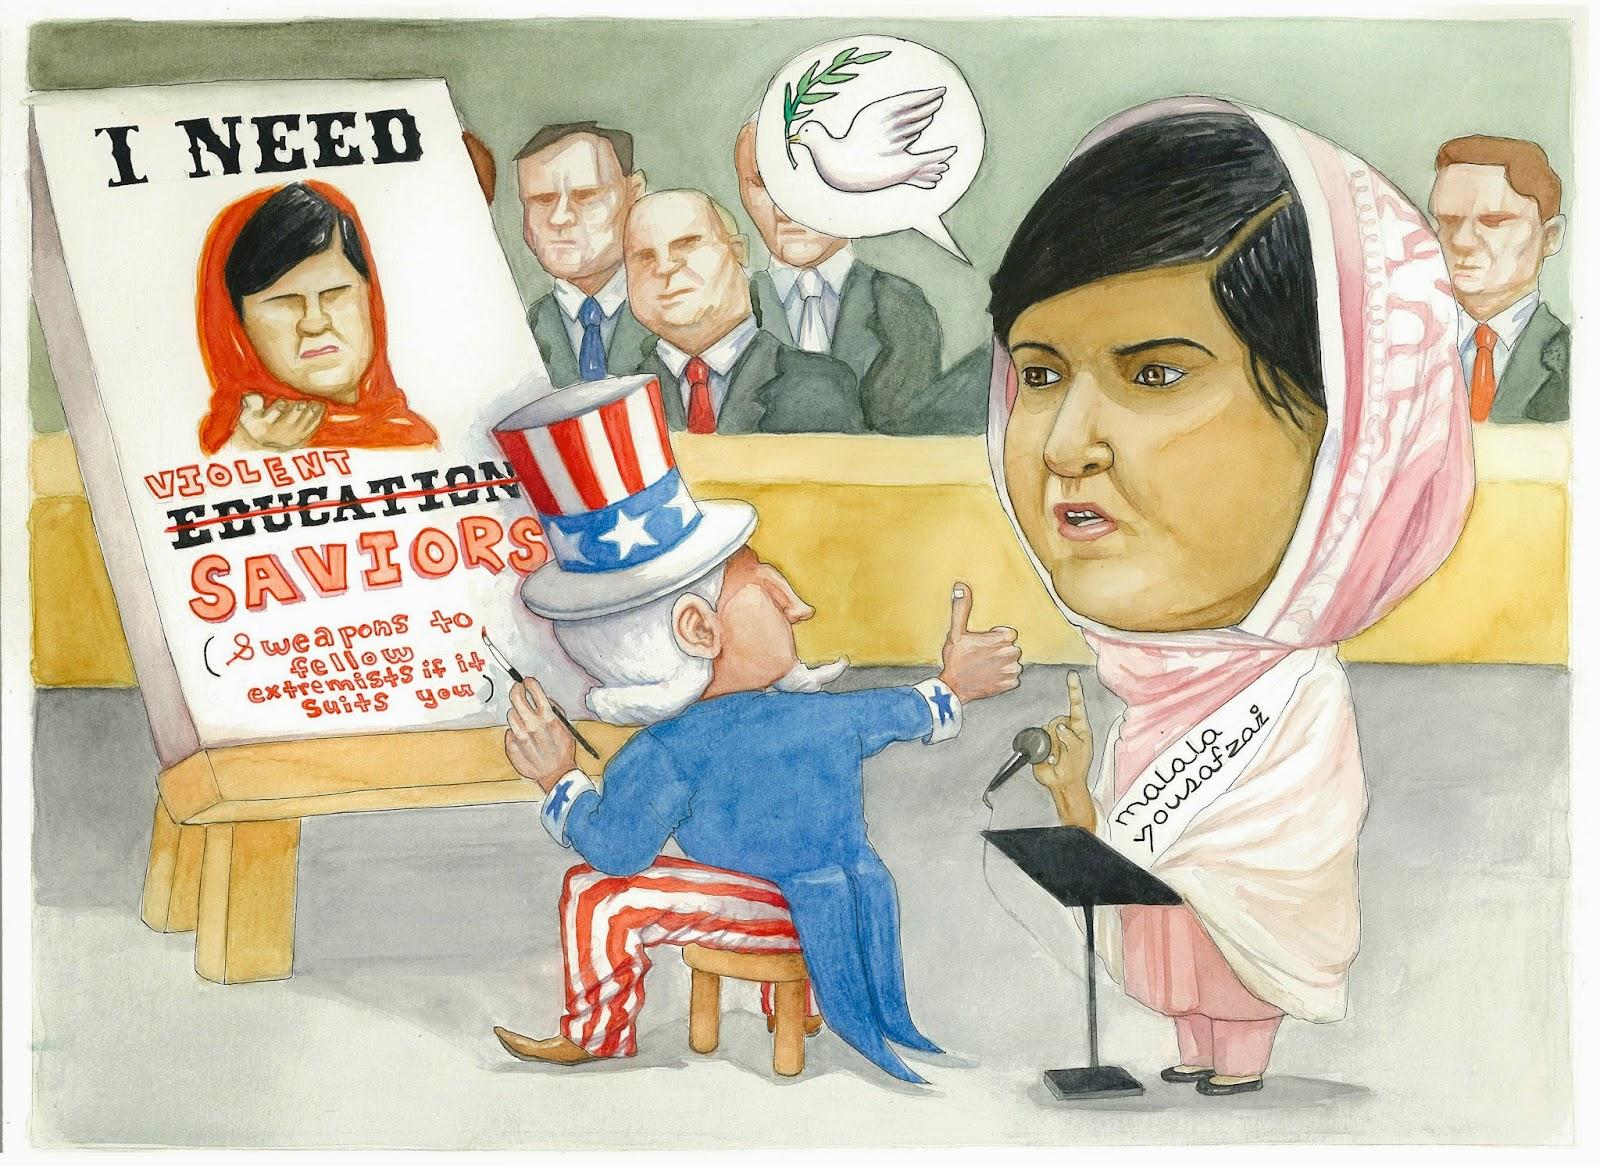 Melanie West's take on the US media portrayal of Malala Yousafzai